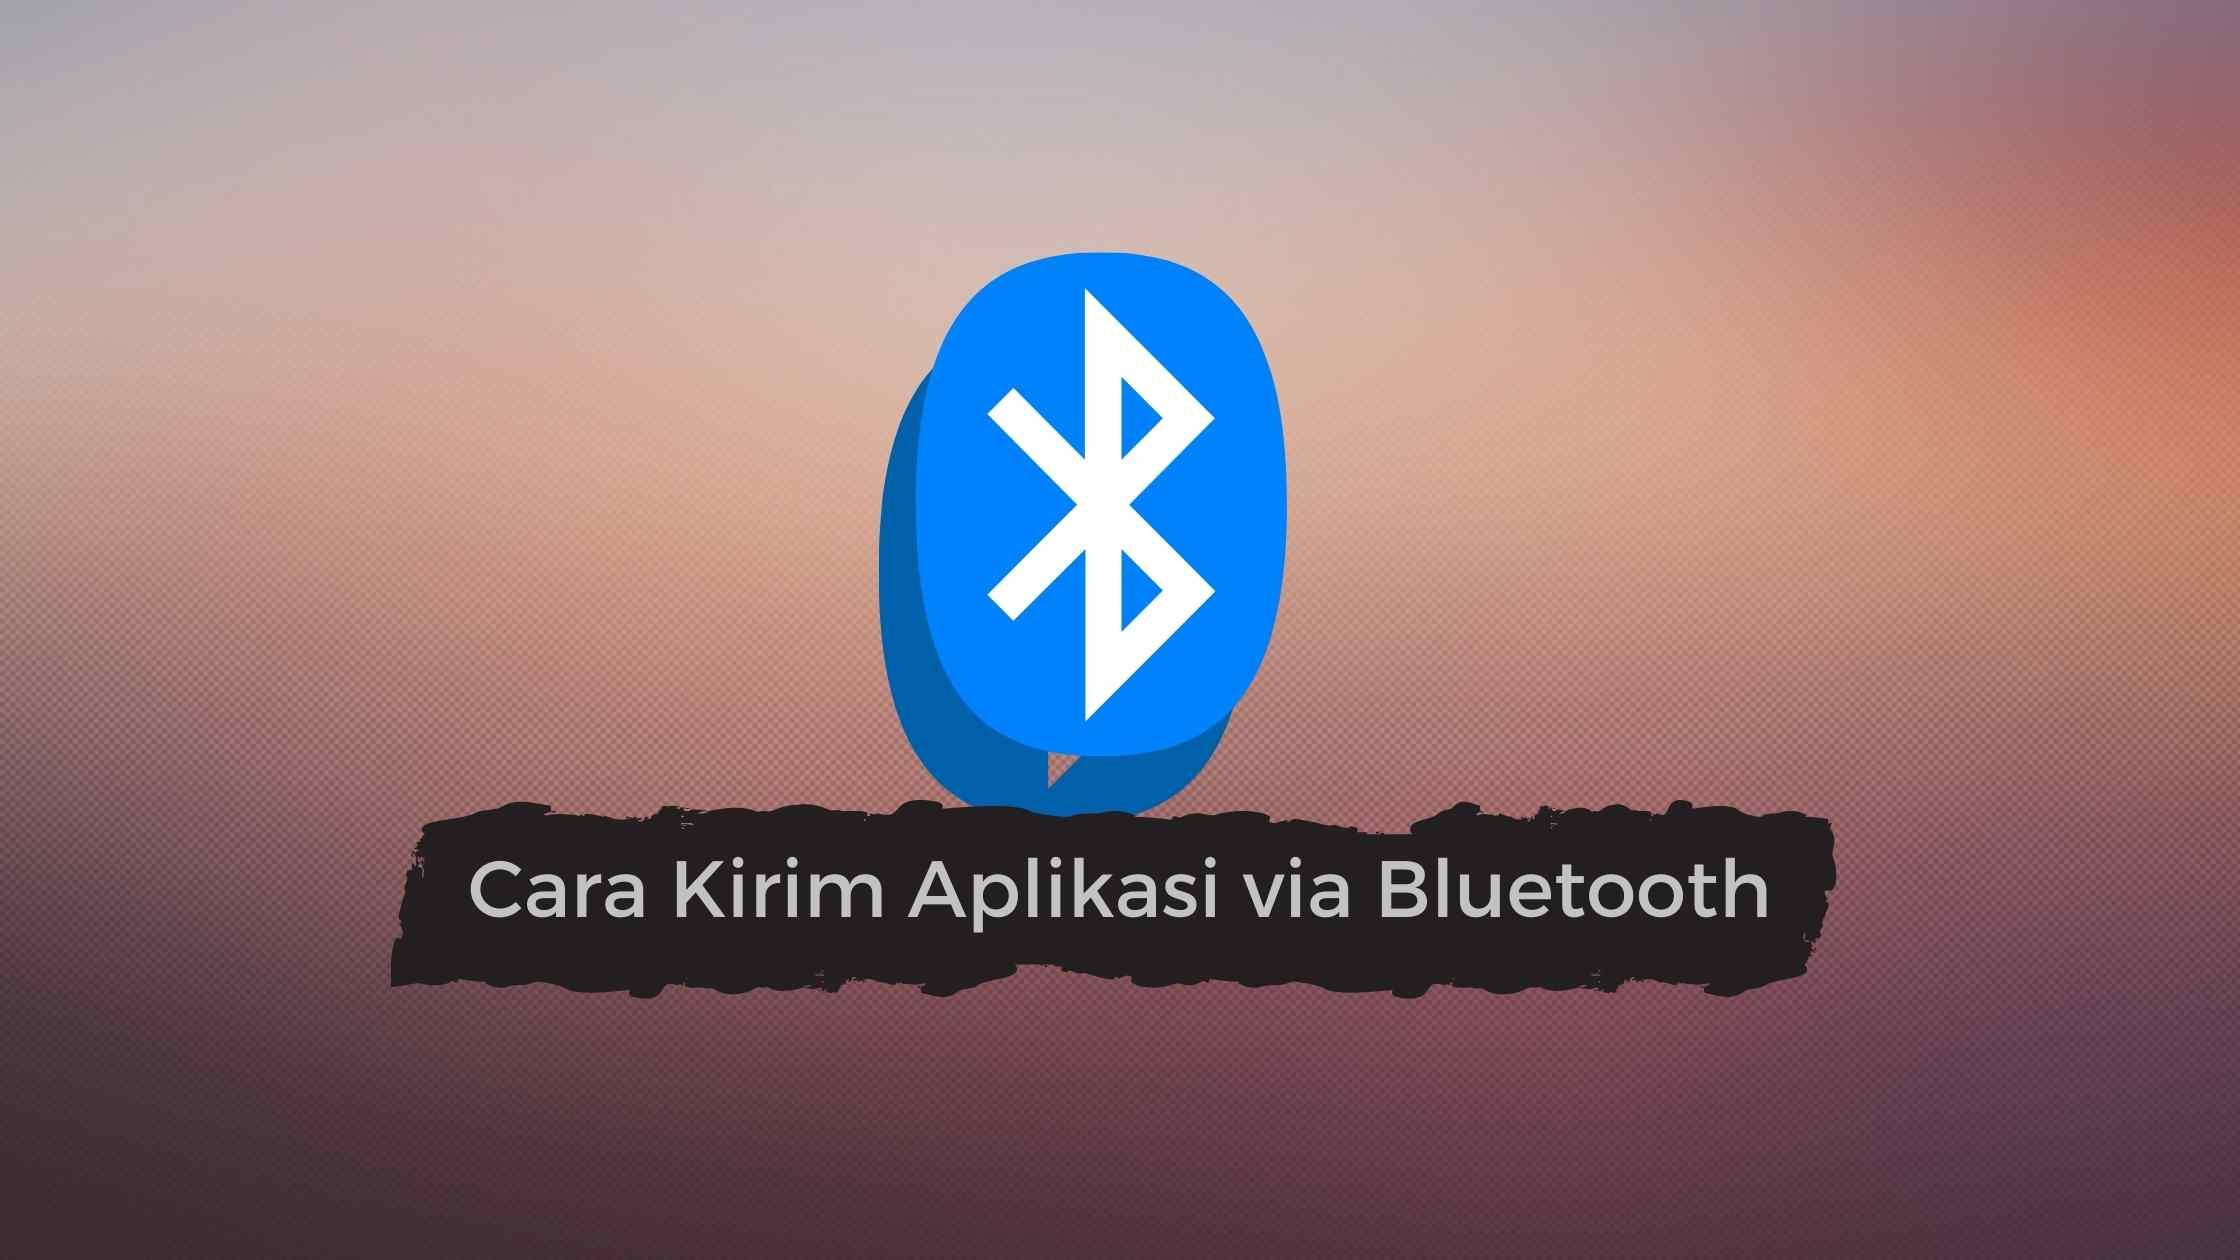 Cara kirim aplikasi lewat Bluetooth